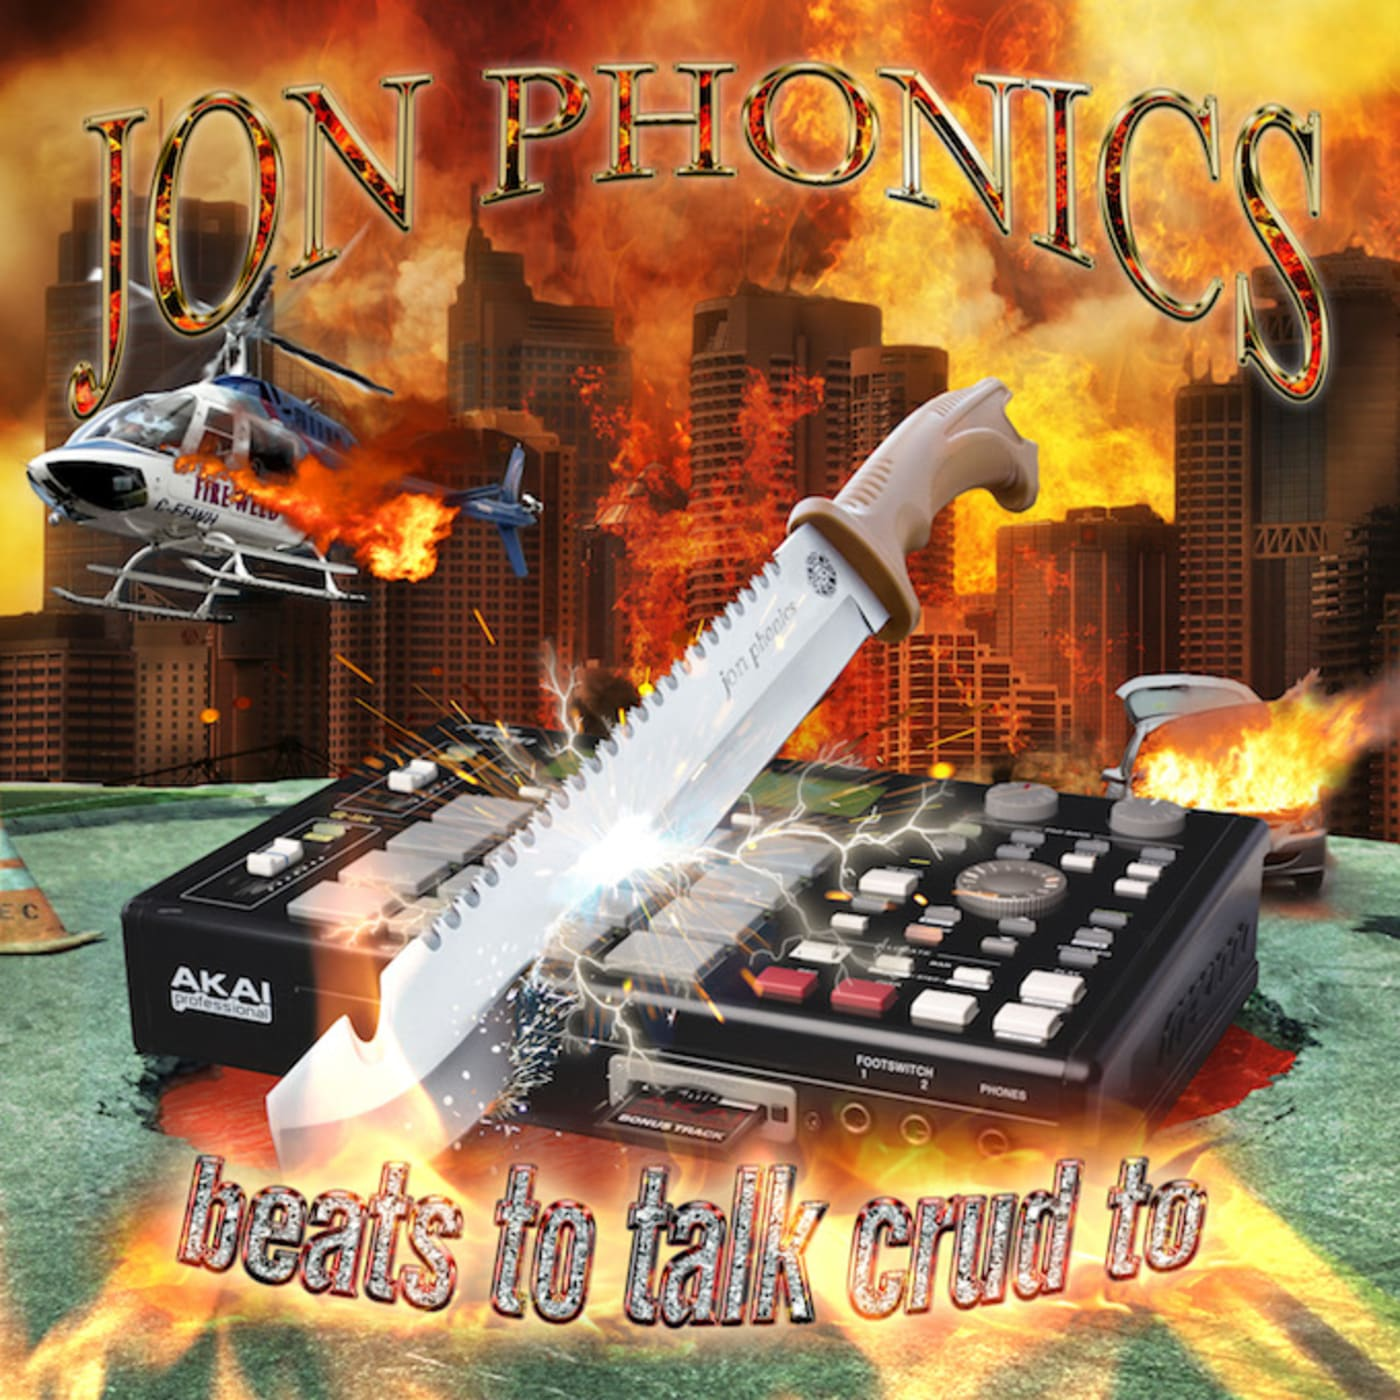 jon phonics beat tape cover